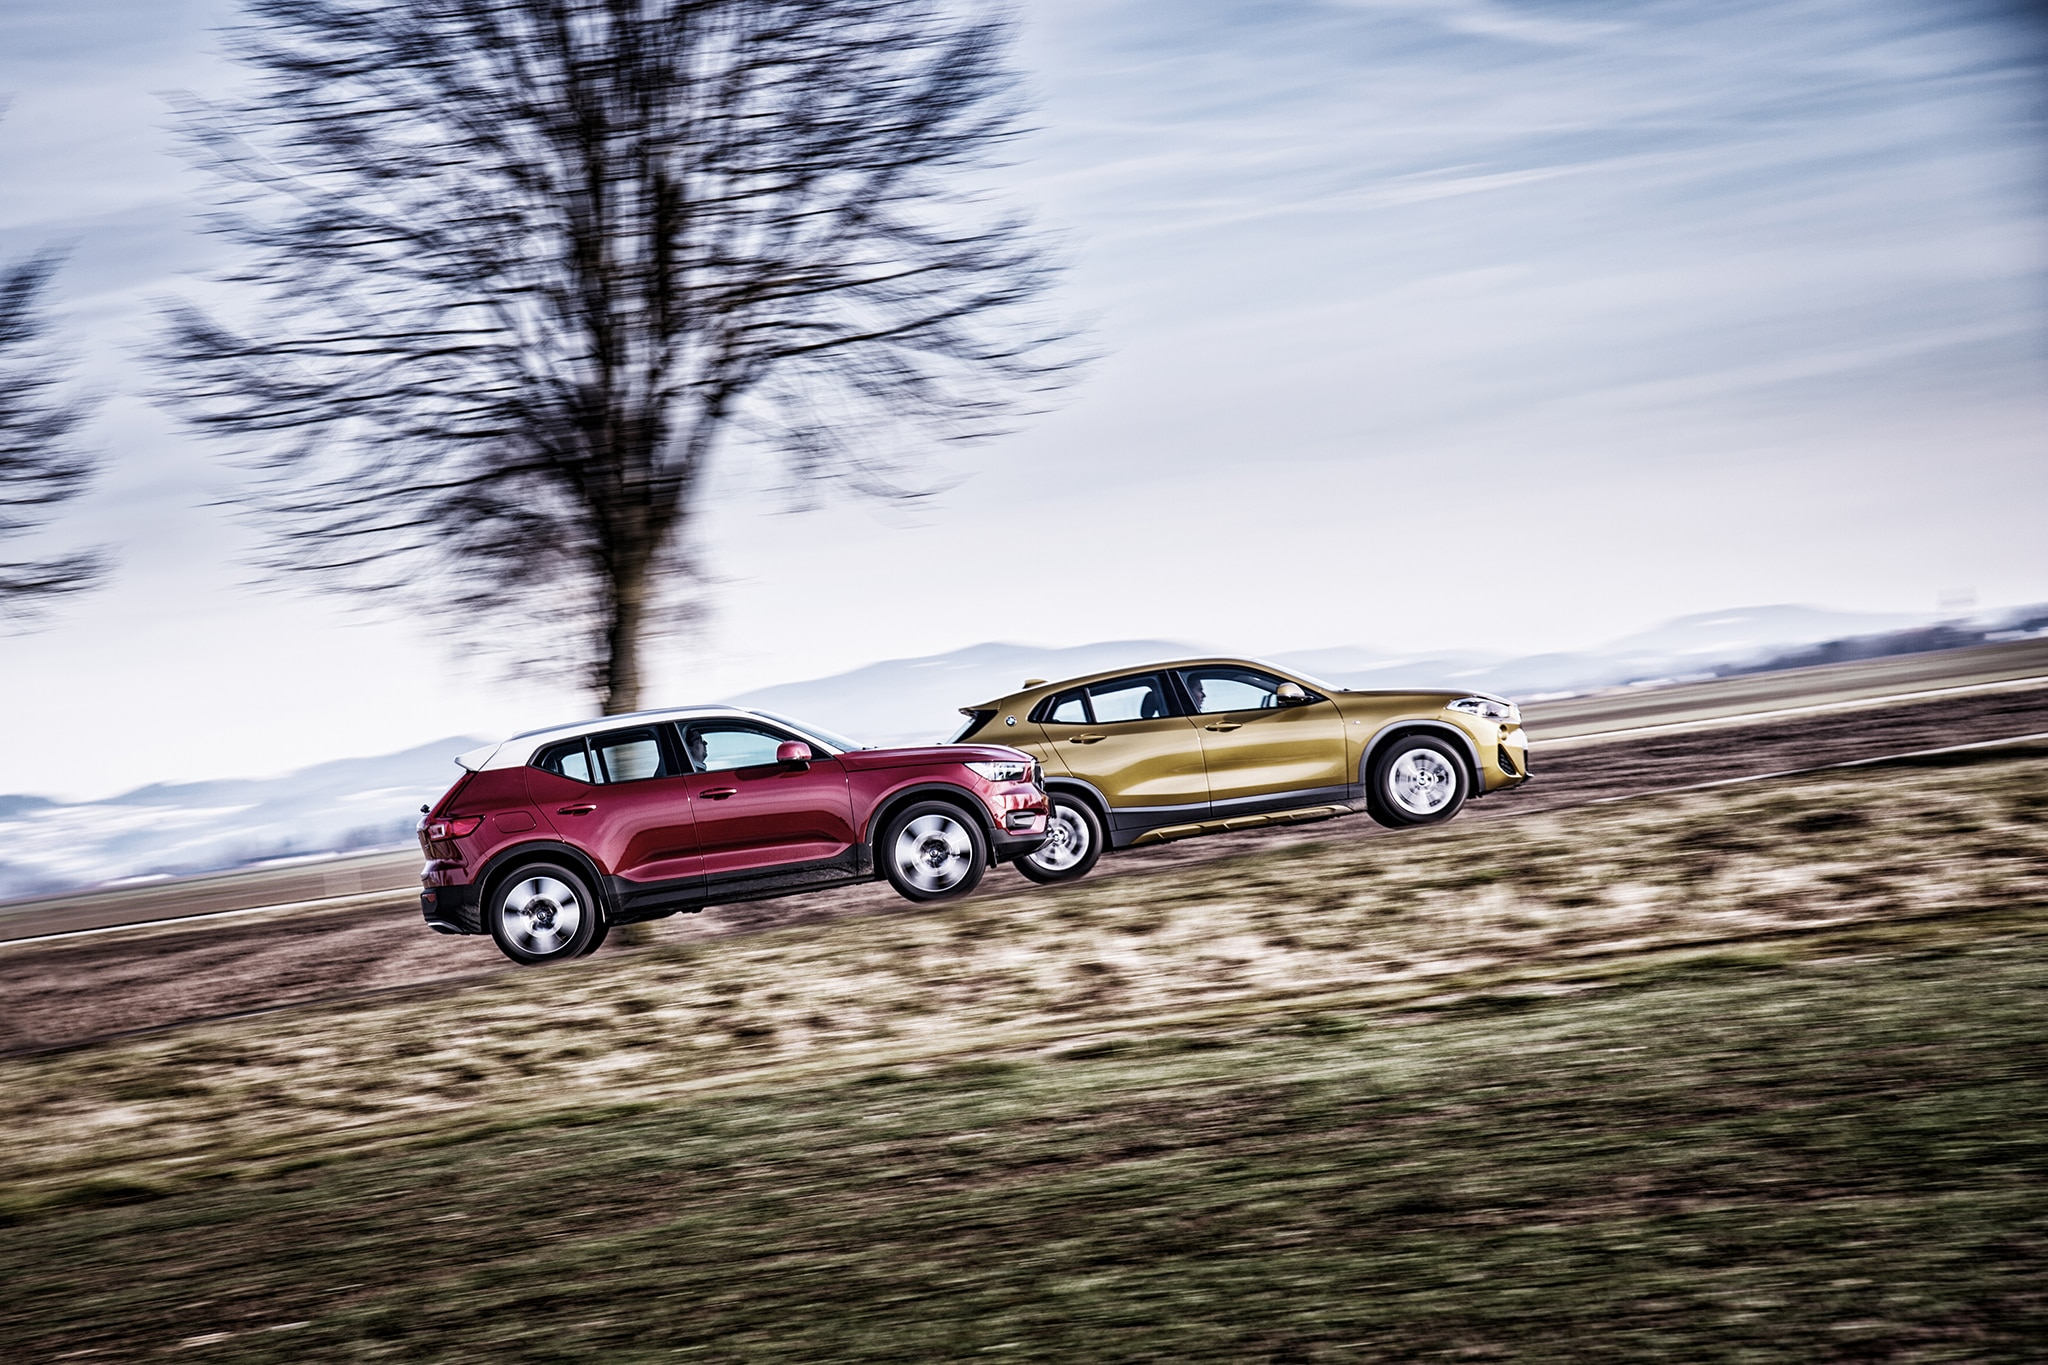 2018 BMW X2 vs 2019 Volvo XC40 vs 2018 Jaguar E Pace